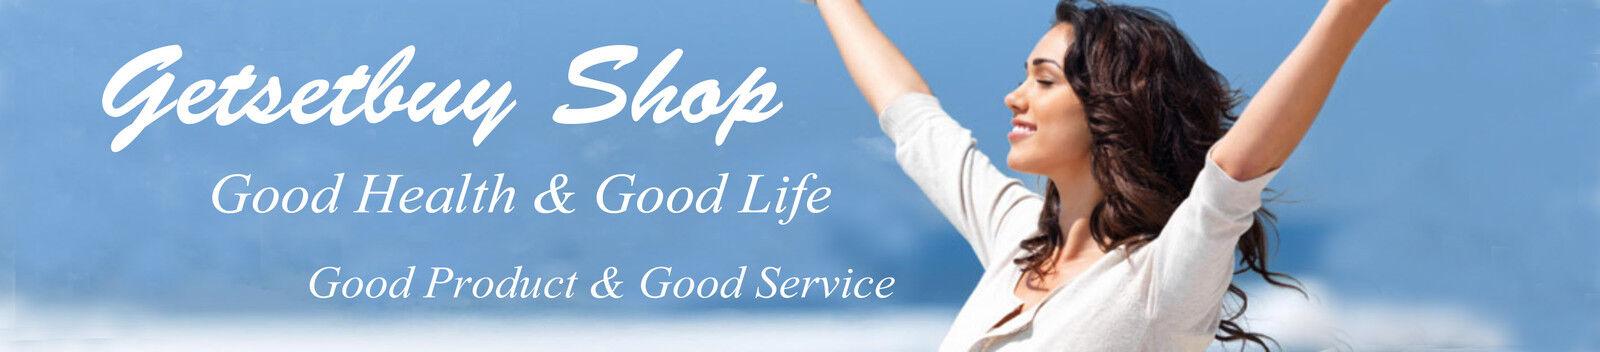 Get Set Buy Shop